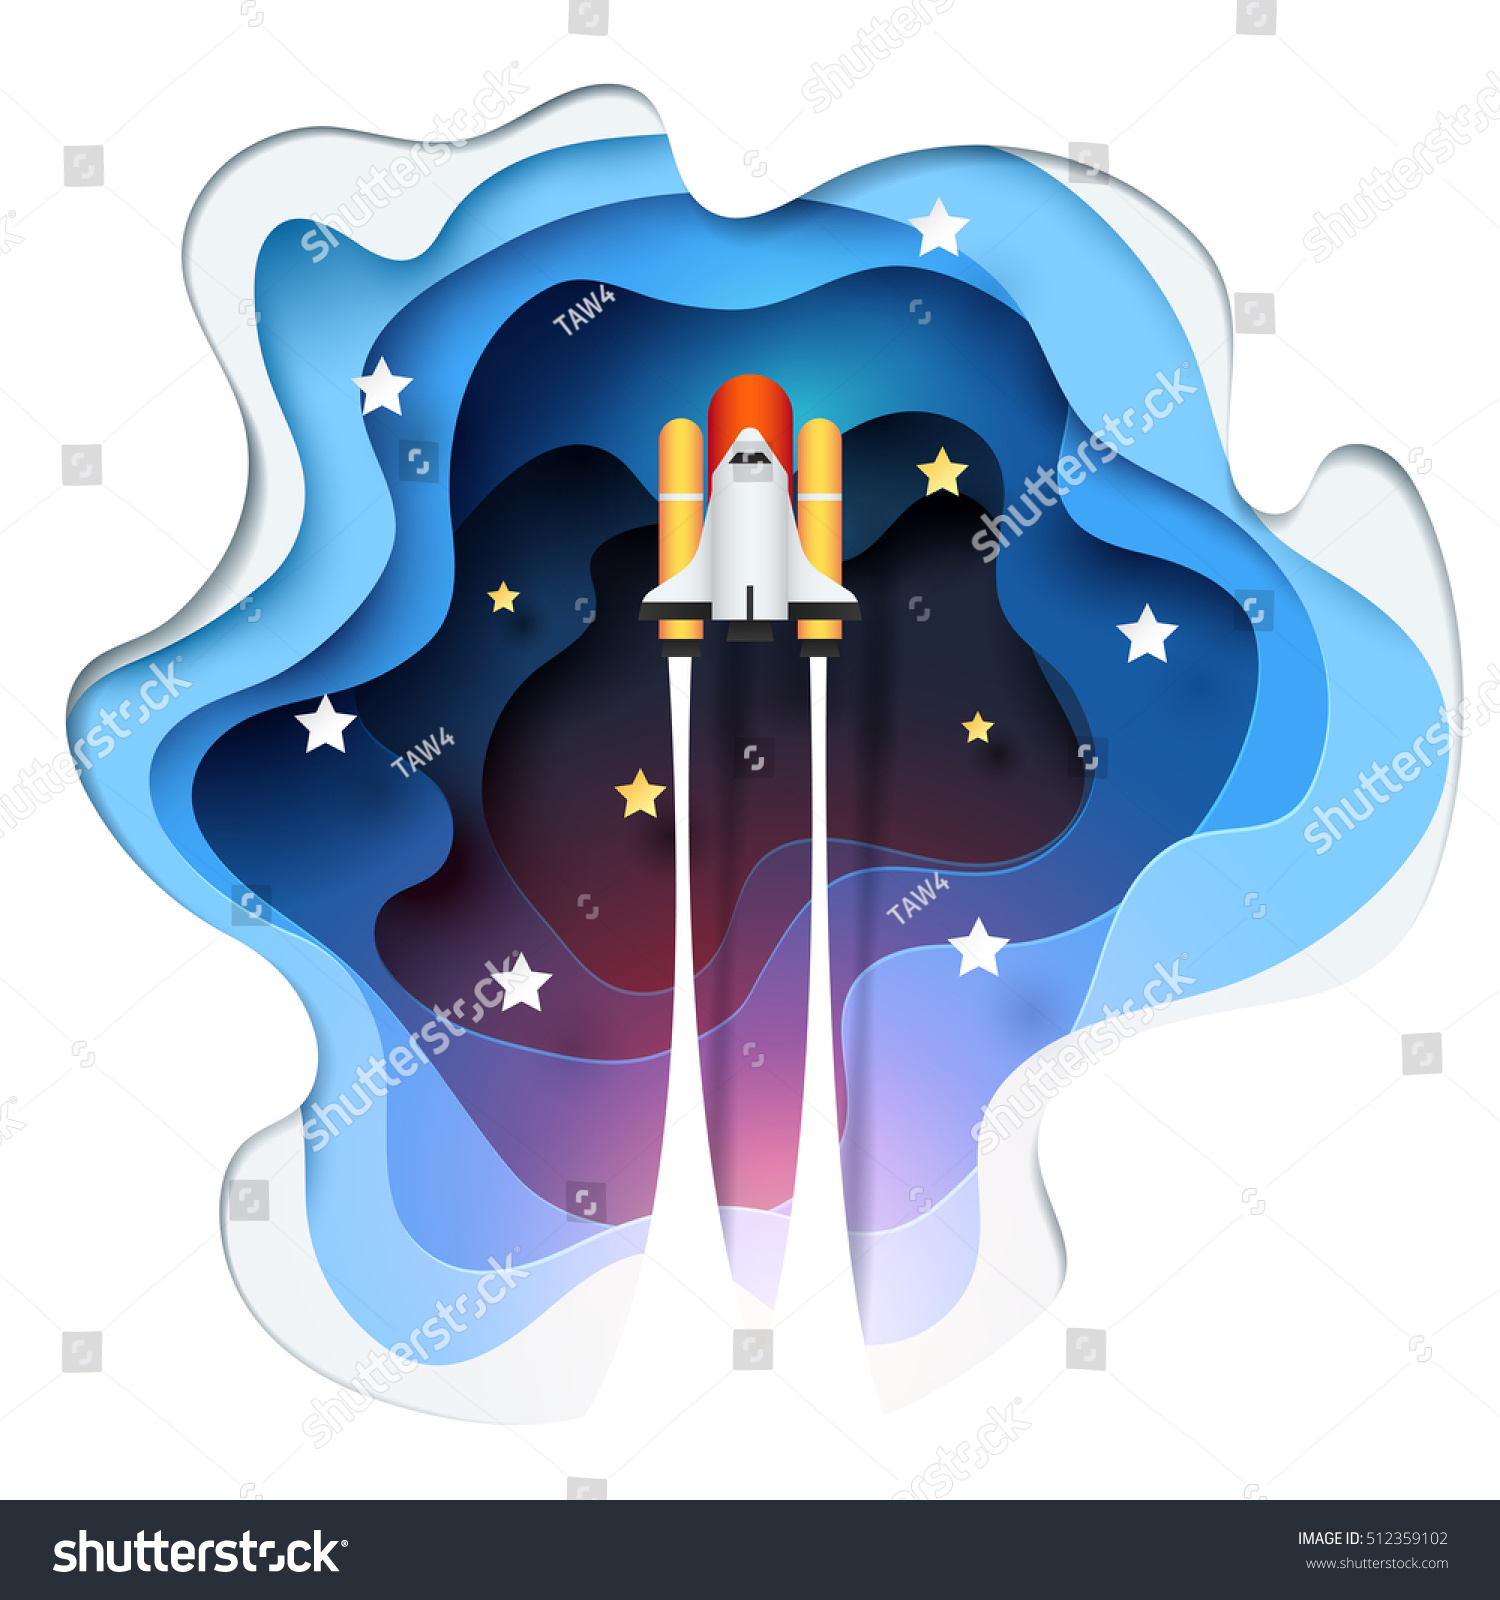 space exploration essays